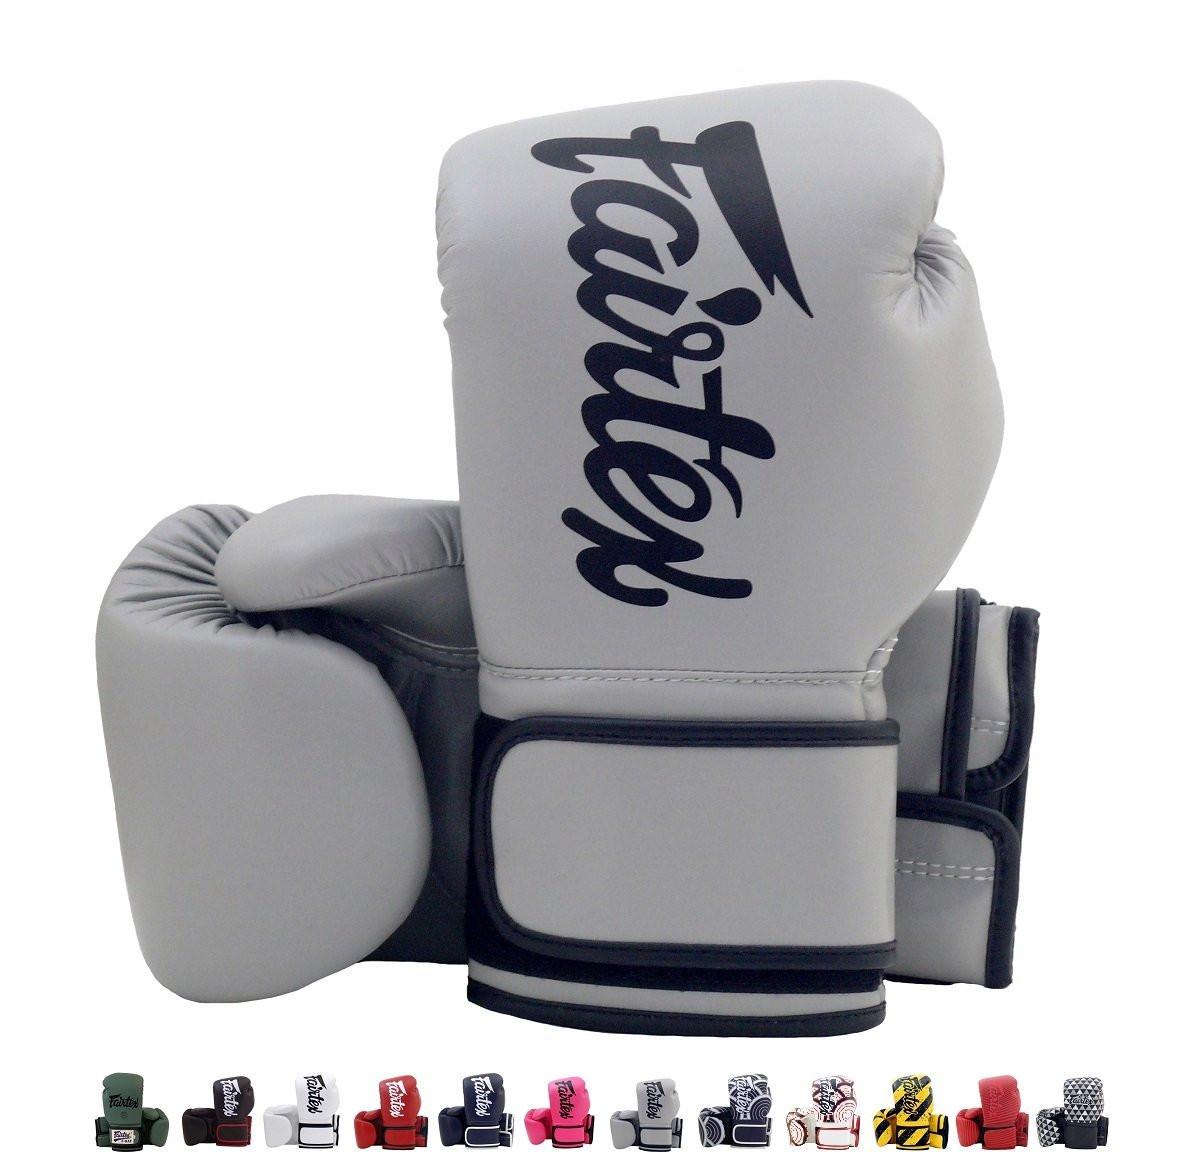 Fairtex Muay Thai Boxing Gloves BGV14